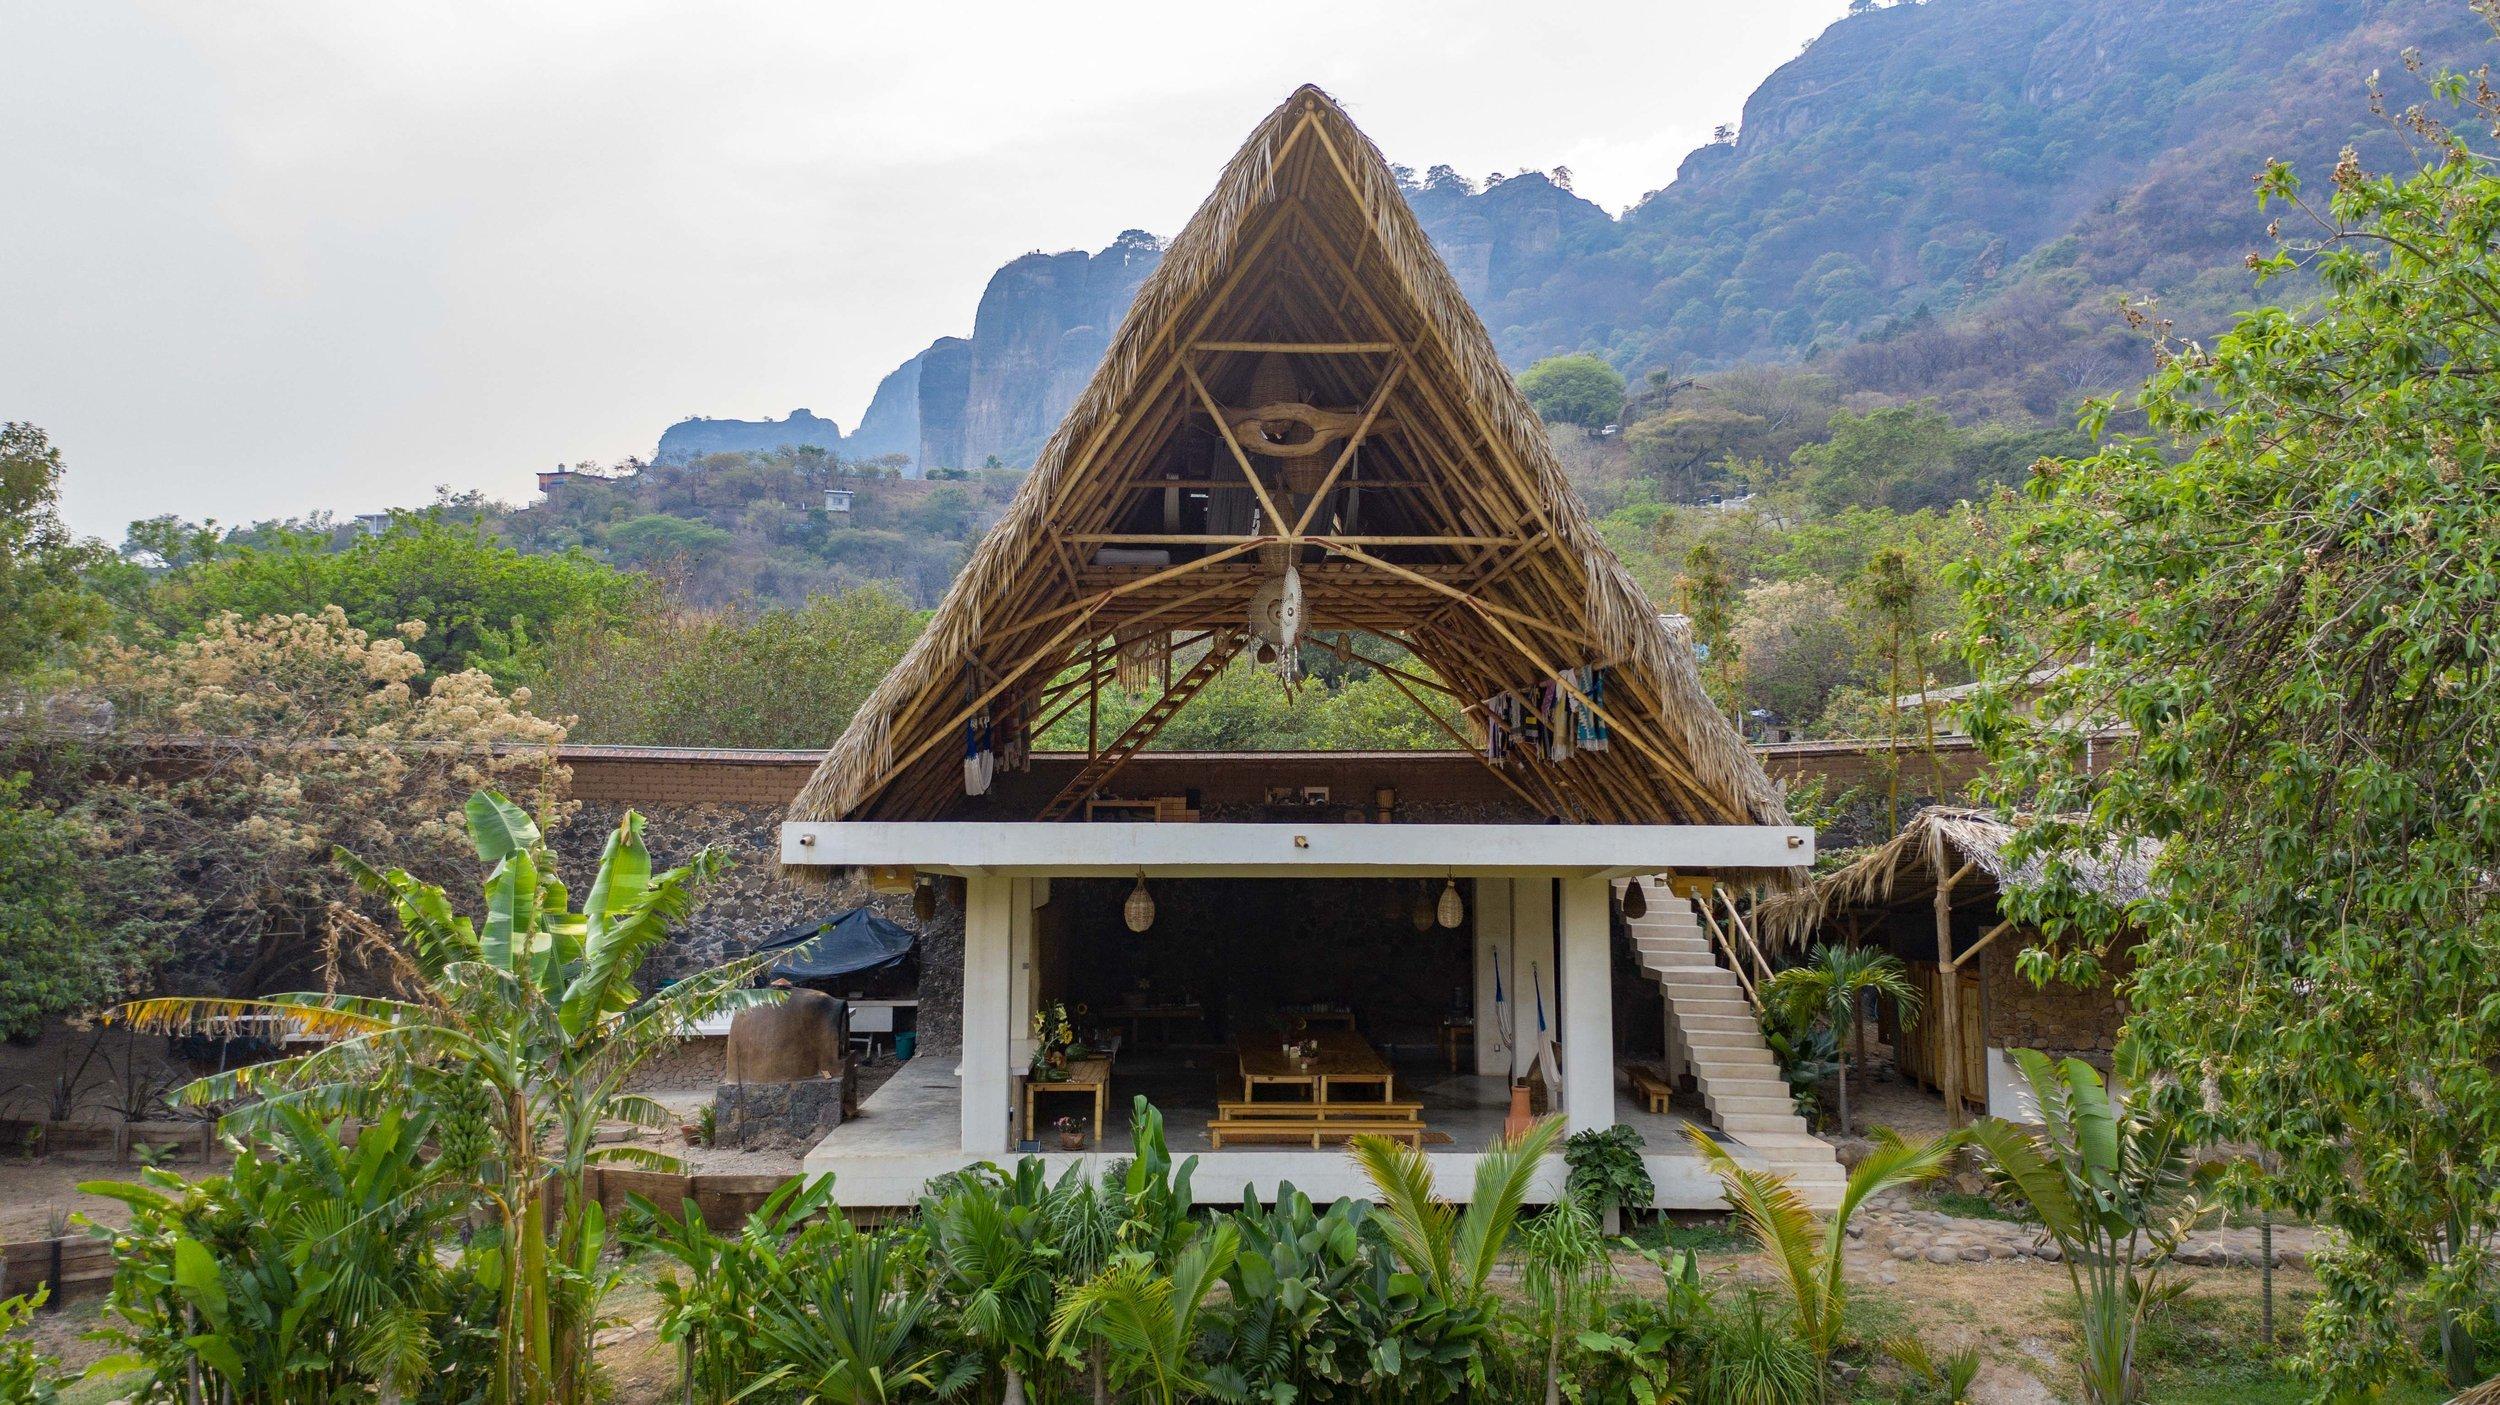 Bamboostruction